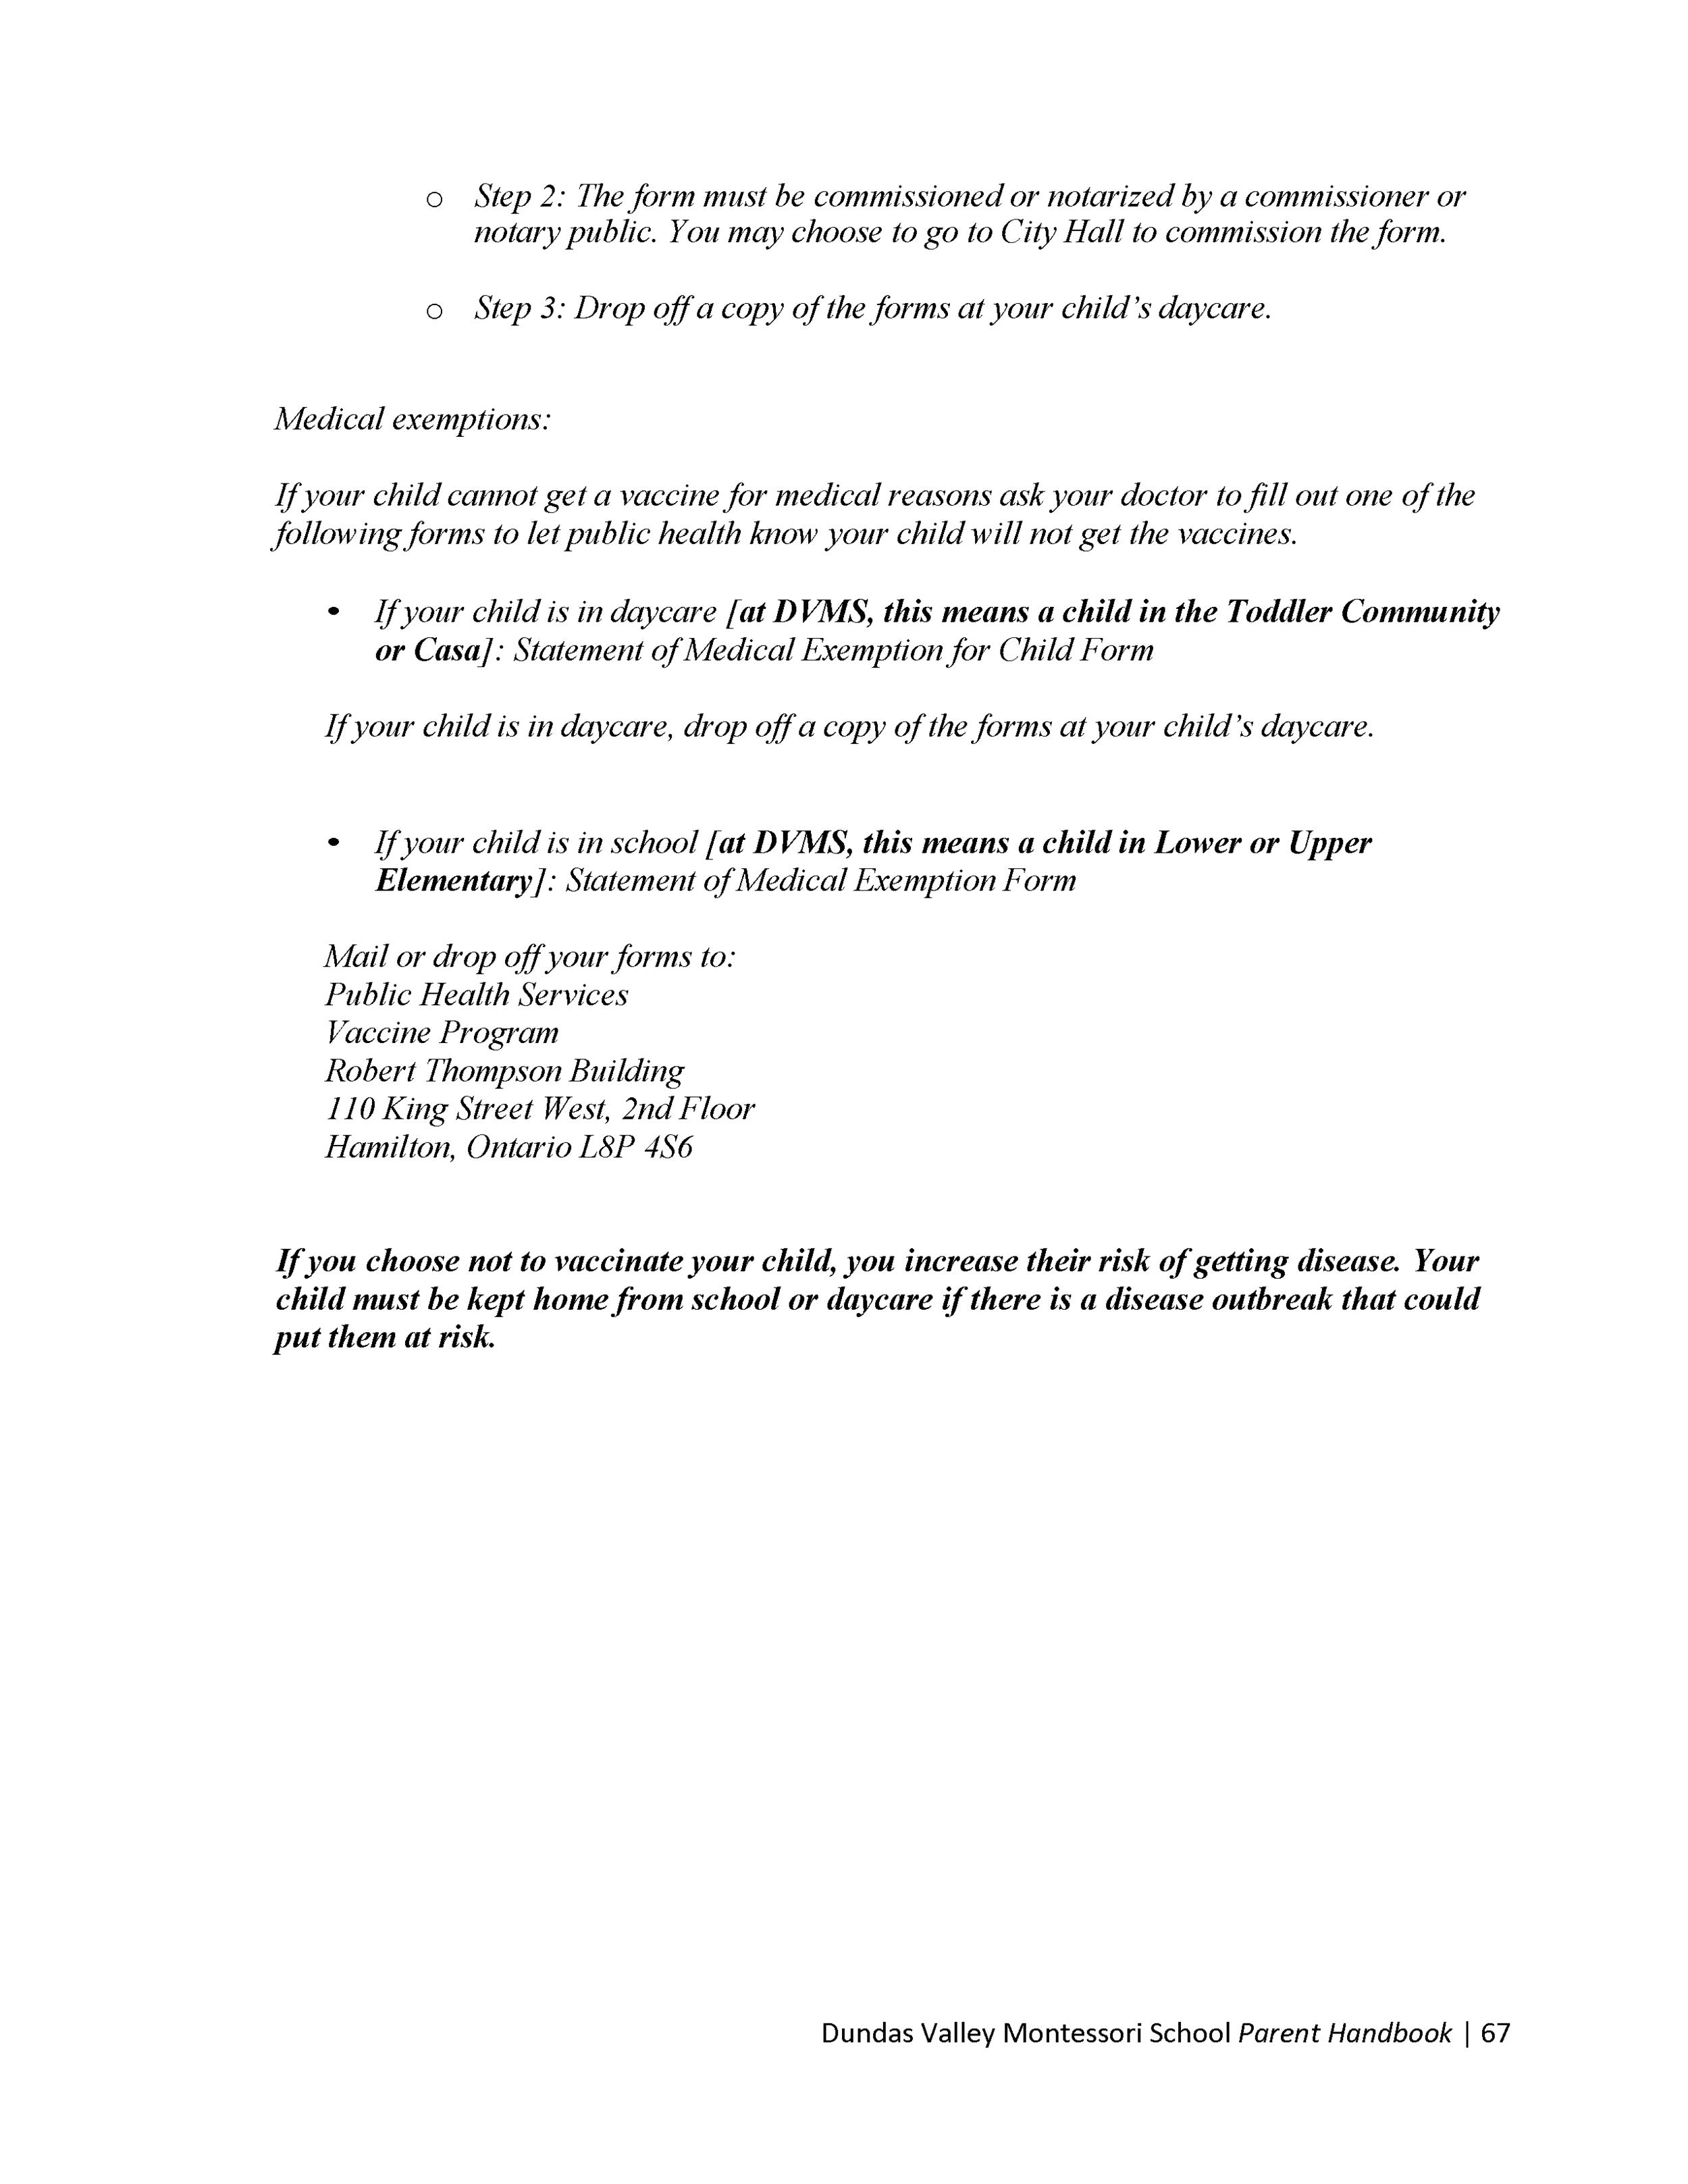 DVMS-Parent-Handbook-19-20_Page_069.png